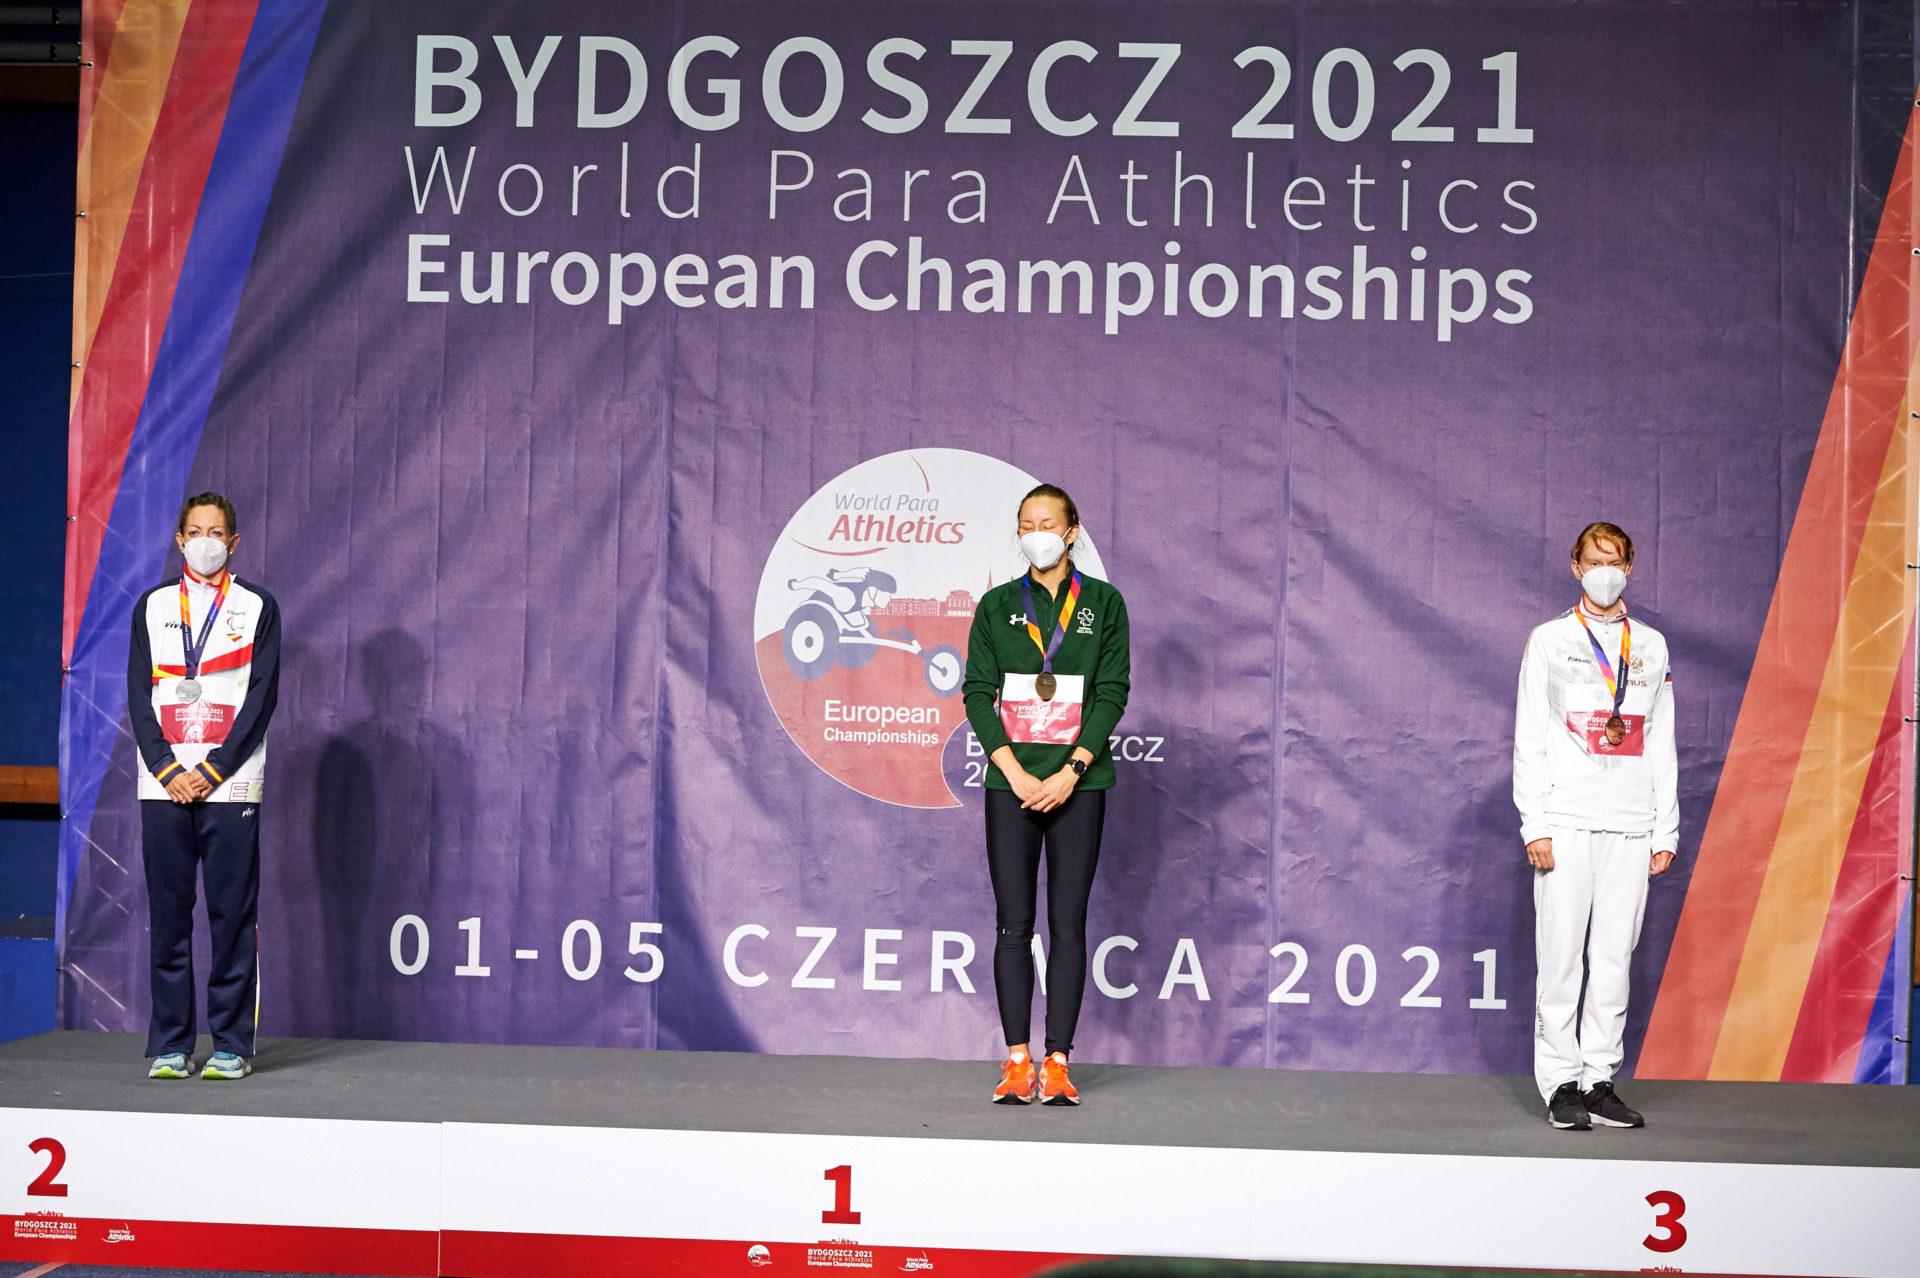 2021-06-01-world-para-athletics-european-championships-bydgoszcz-2021-adrian-stykowski-2